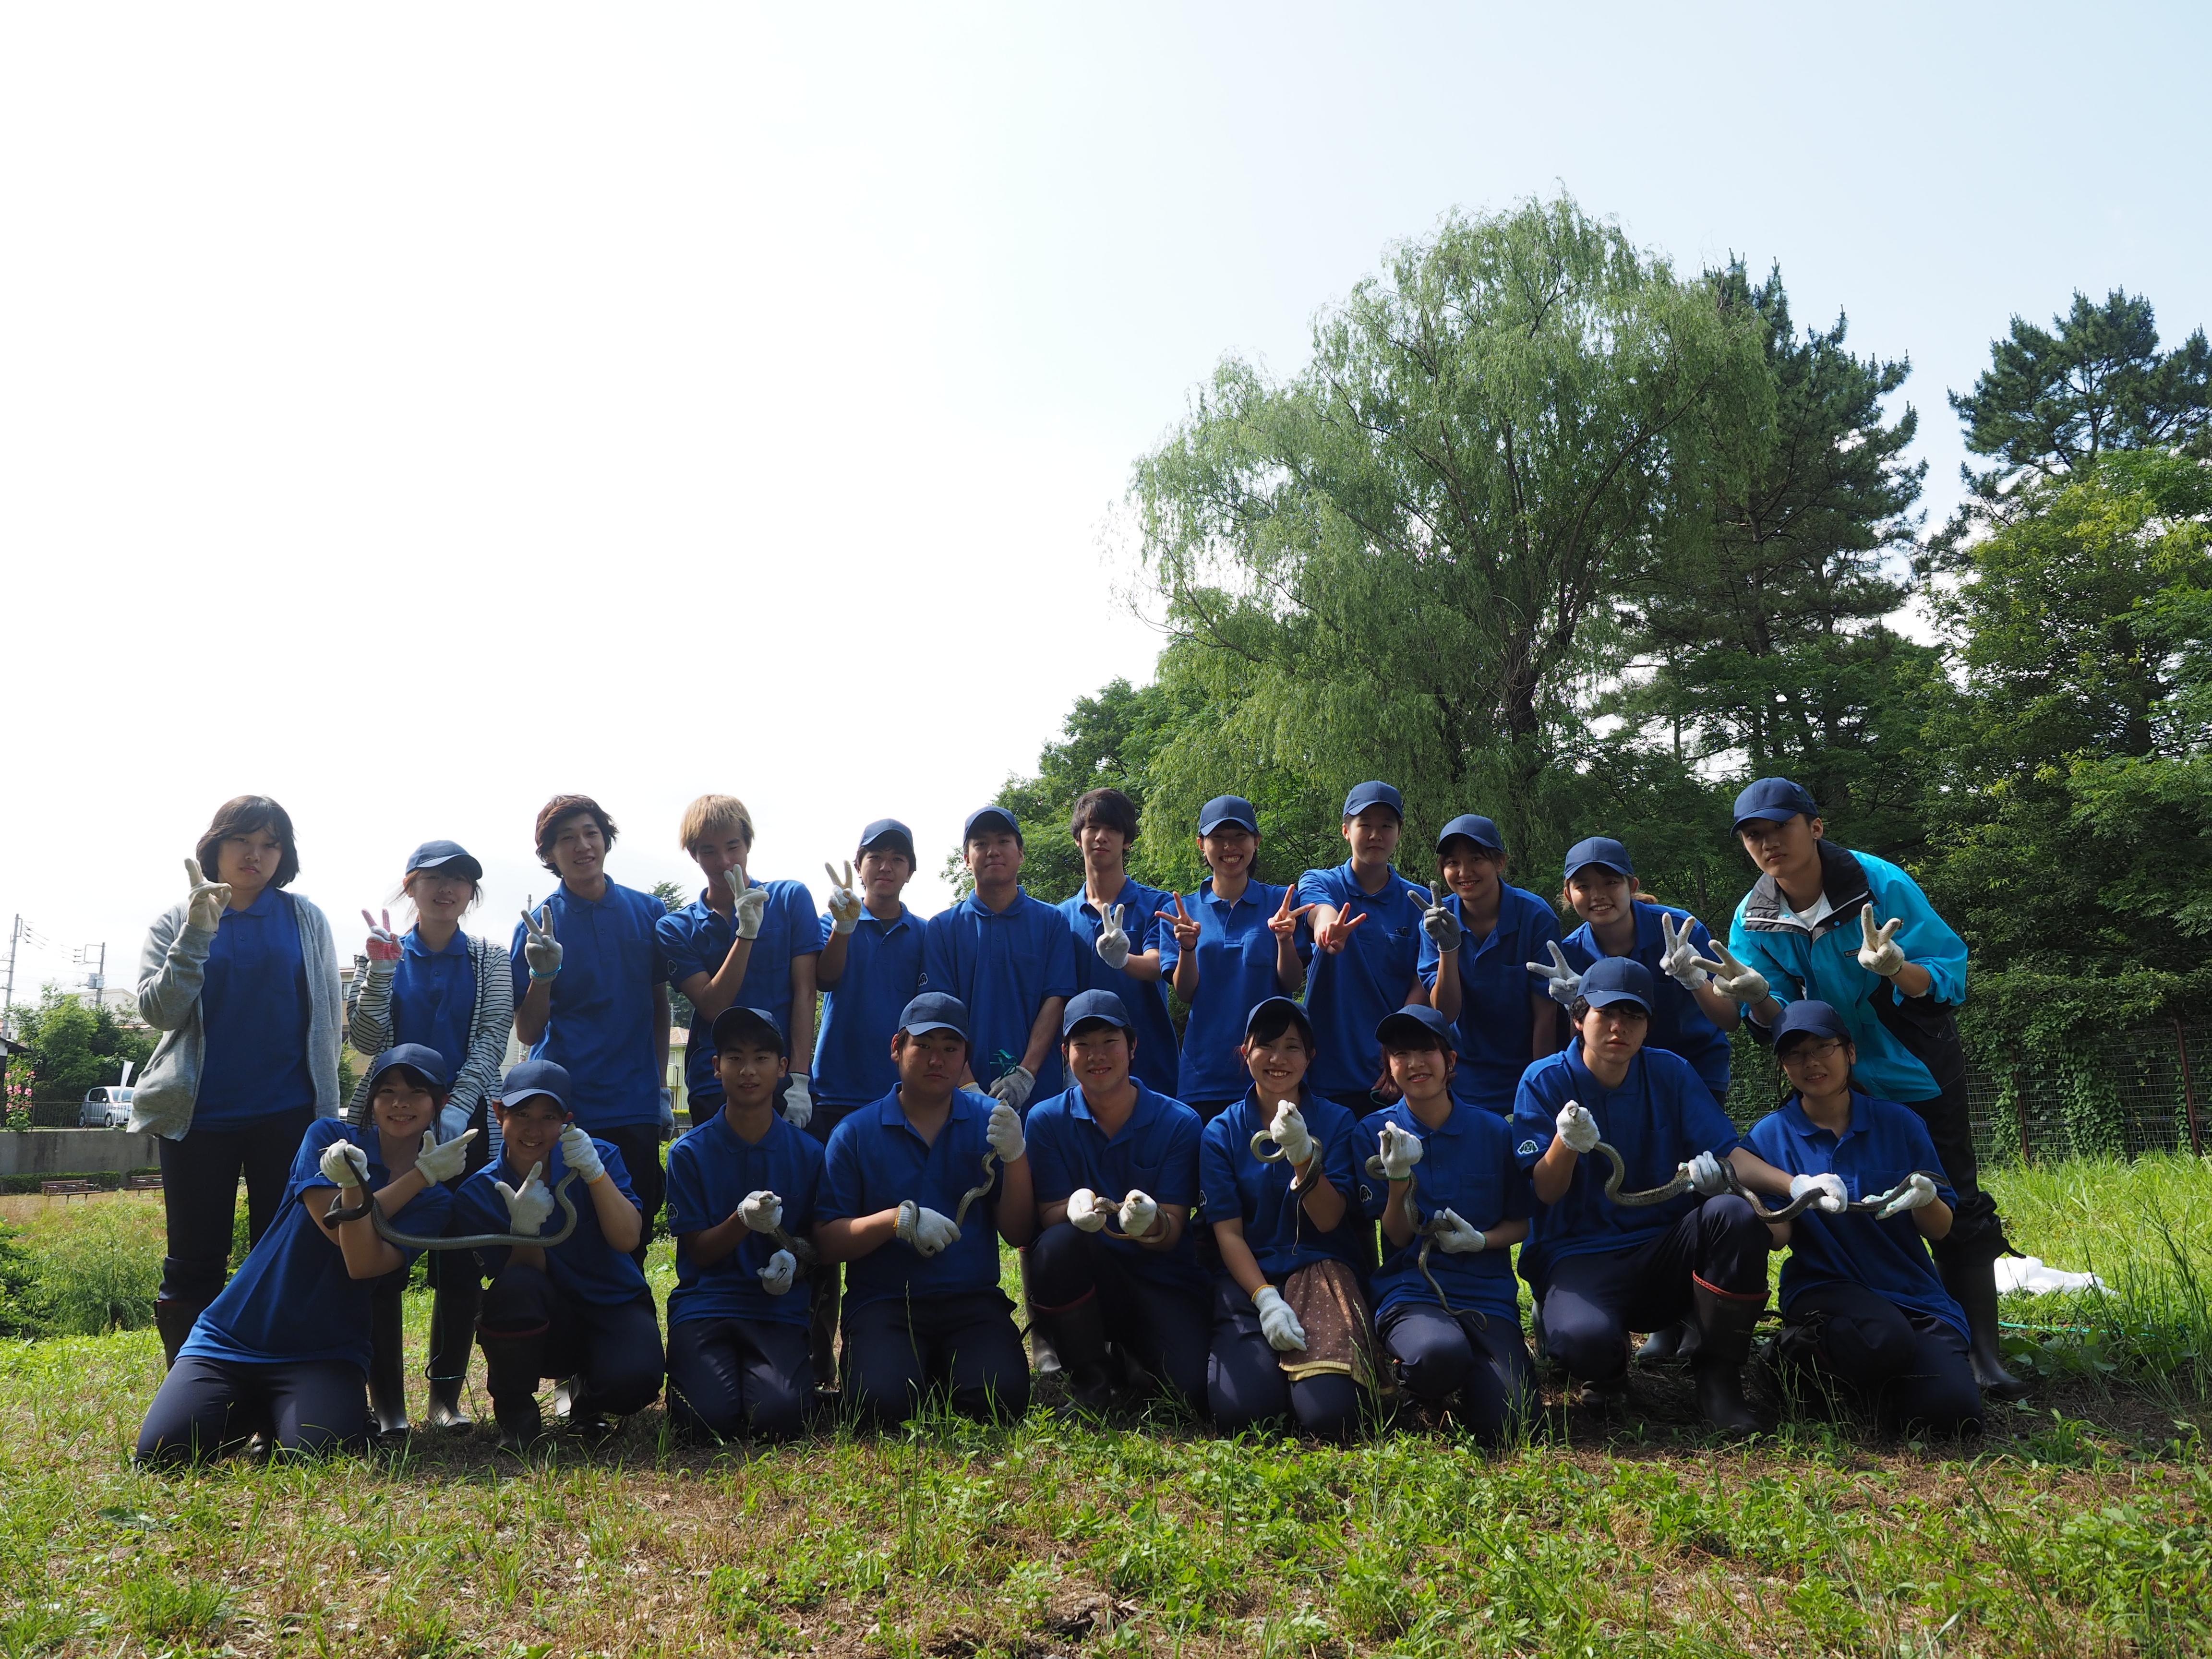 http://tokyo.iac.ac.jp/blog/photos/P6130465.JPG